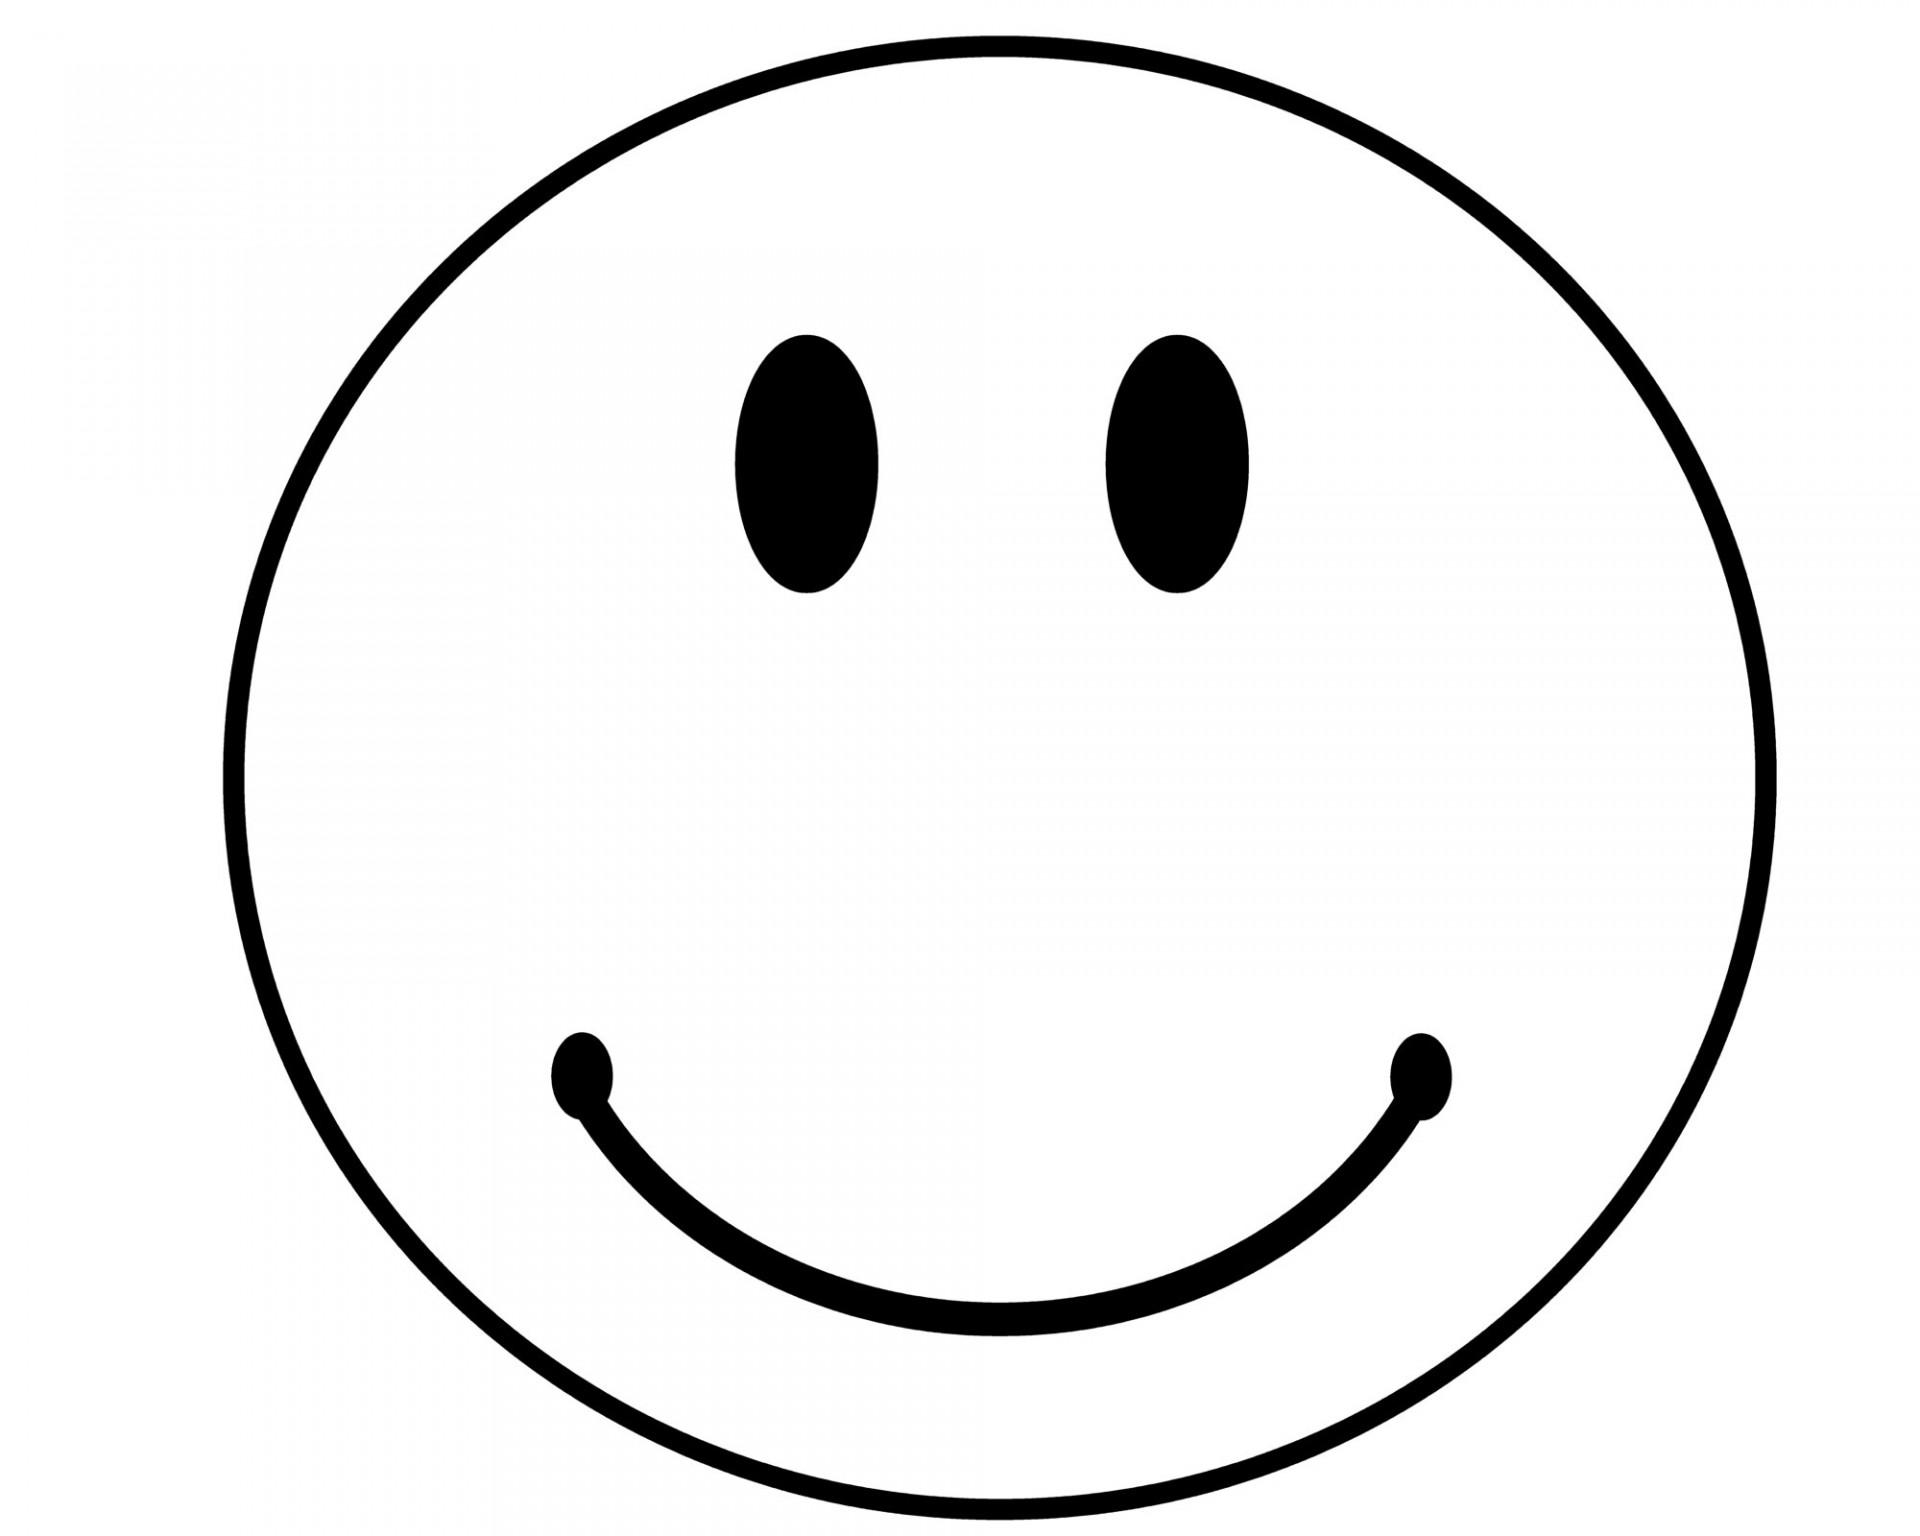 Clip art free stock. Camera clipart smiley face